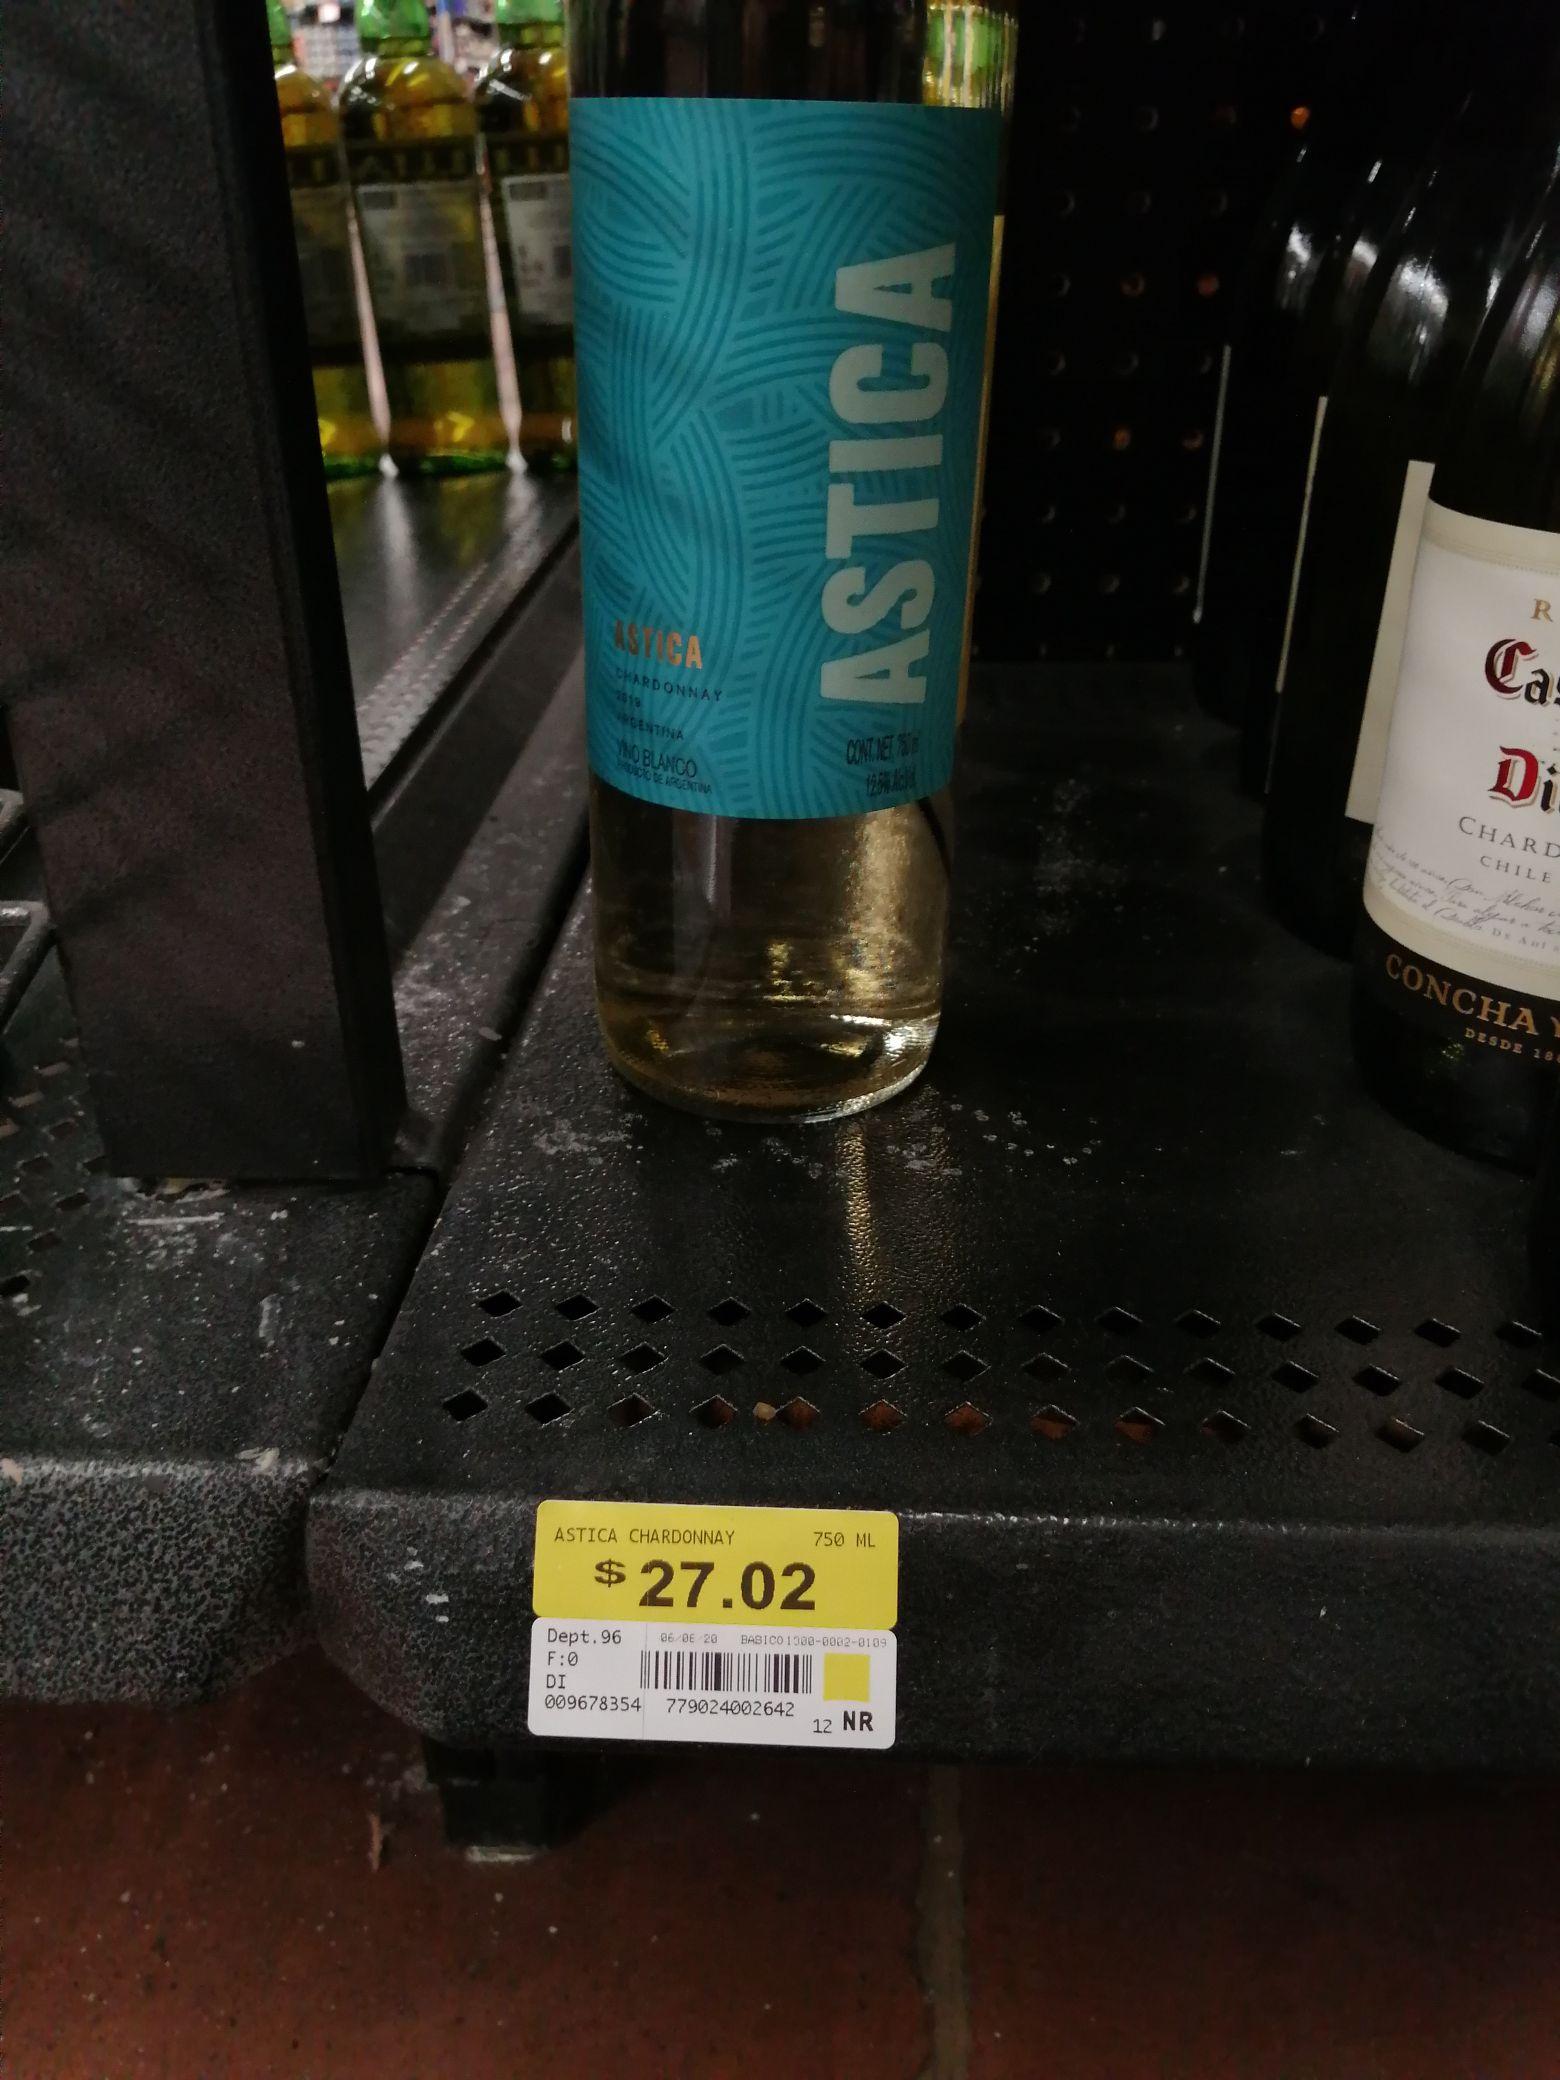 Walmart vino Astica, chardonnay